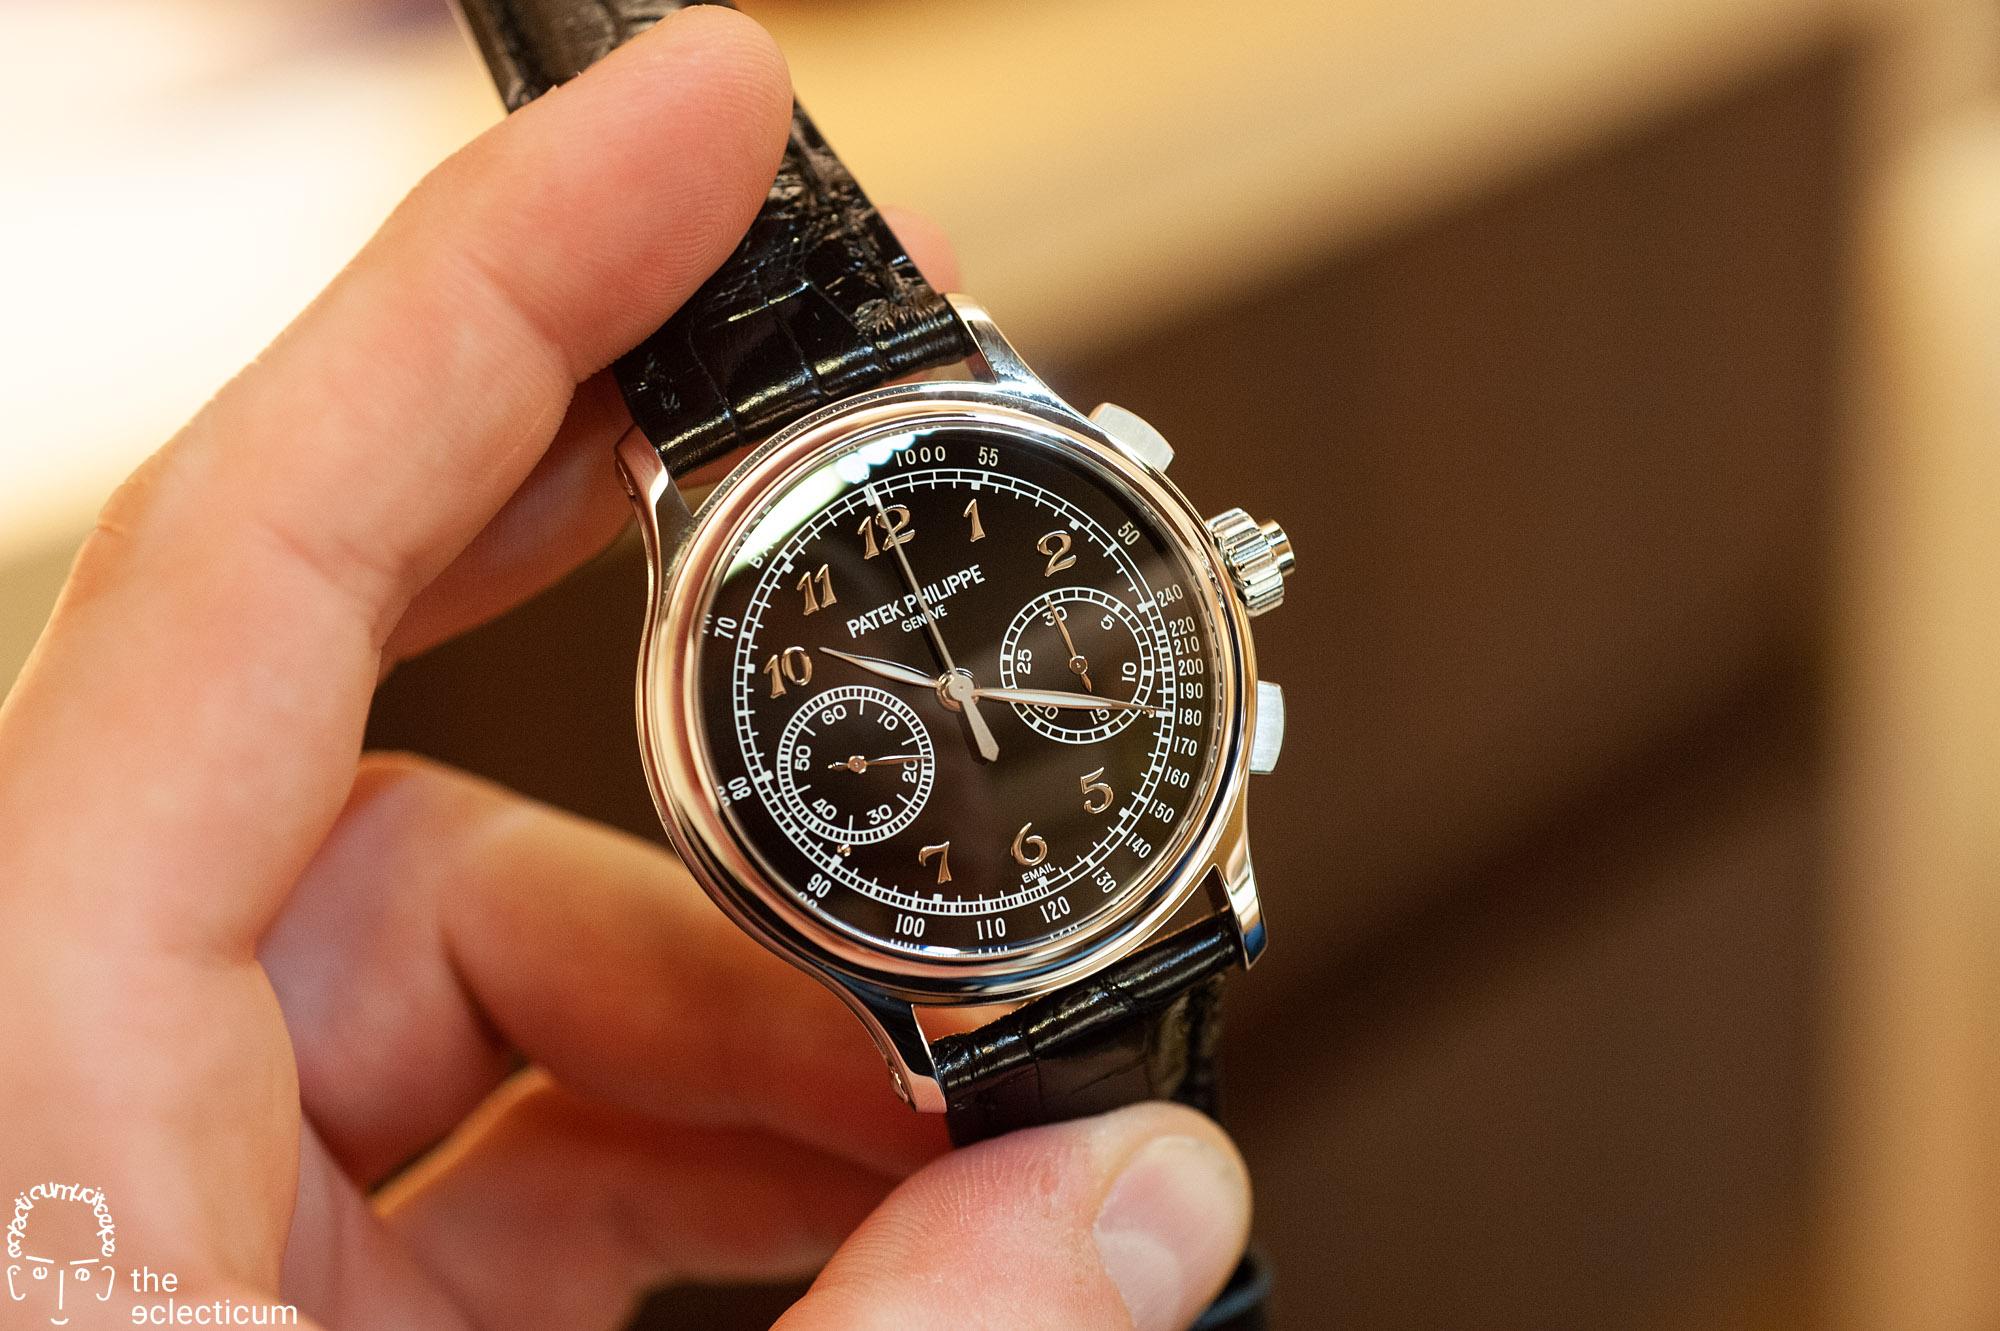 Patek Philippe Split seconds chronograph rattrapante 5370P enamel